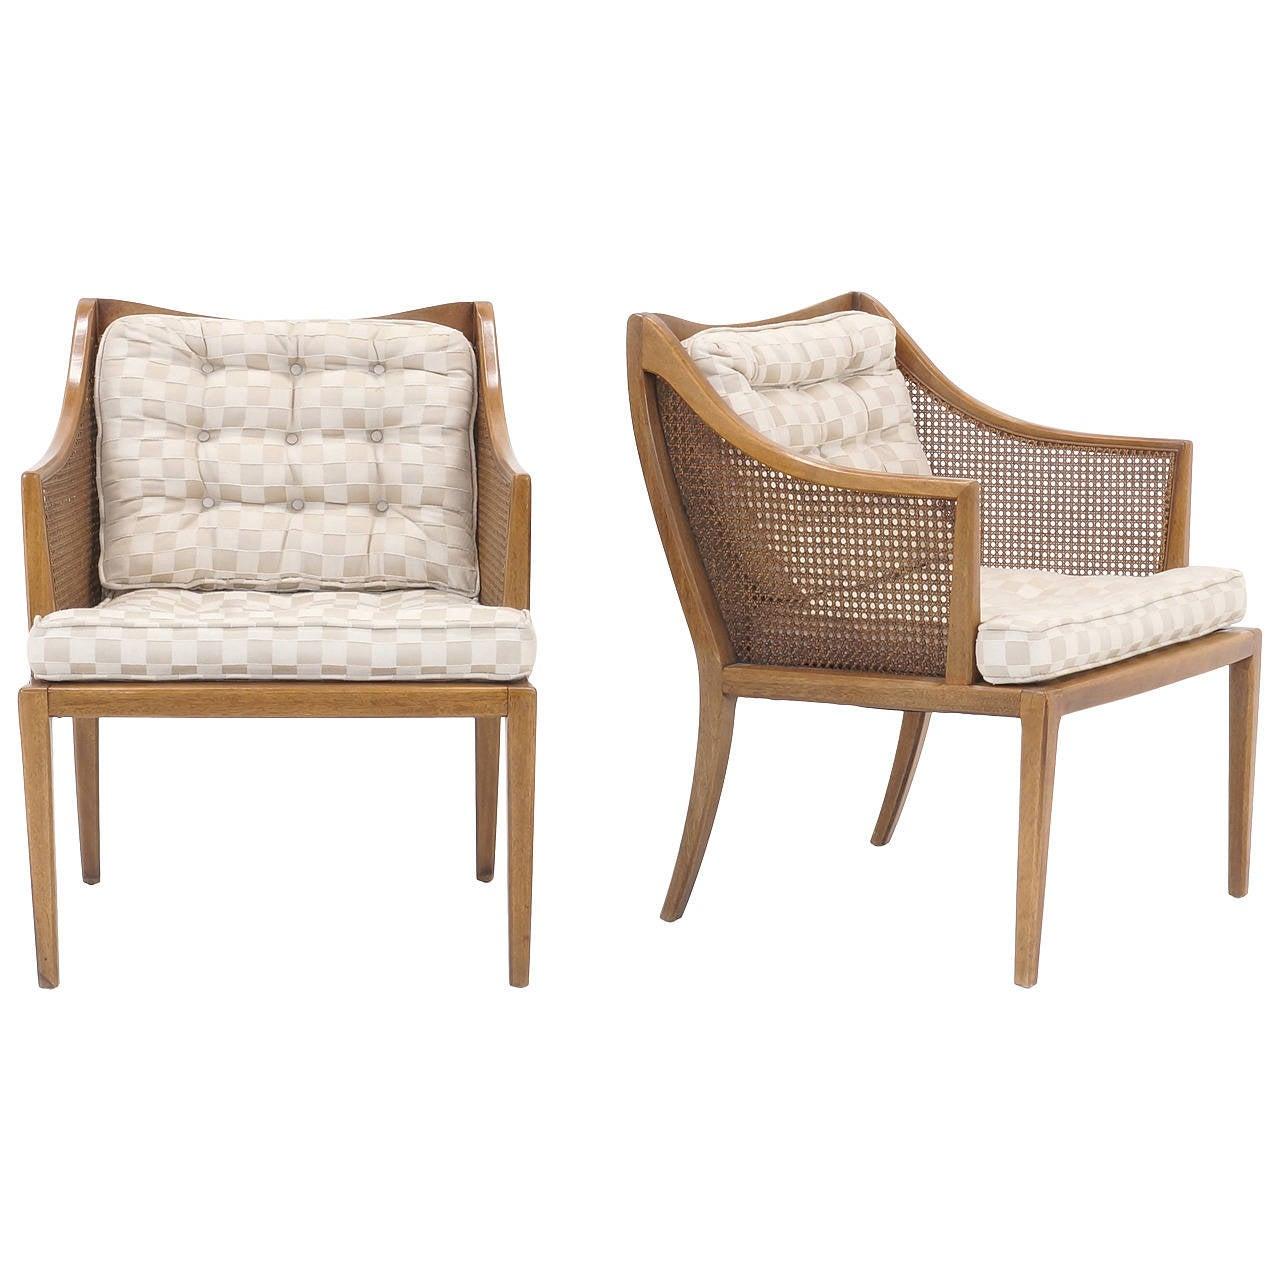 Pair of T. H. Robsjohn Gibbings for Widdicomb Arm Chairs For Sale